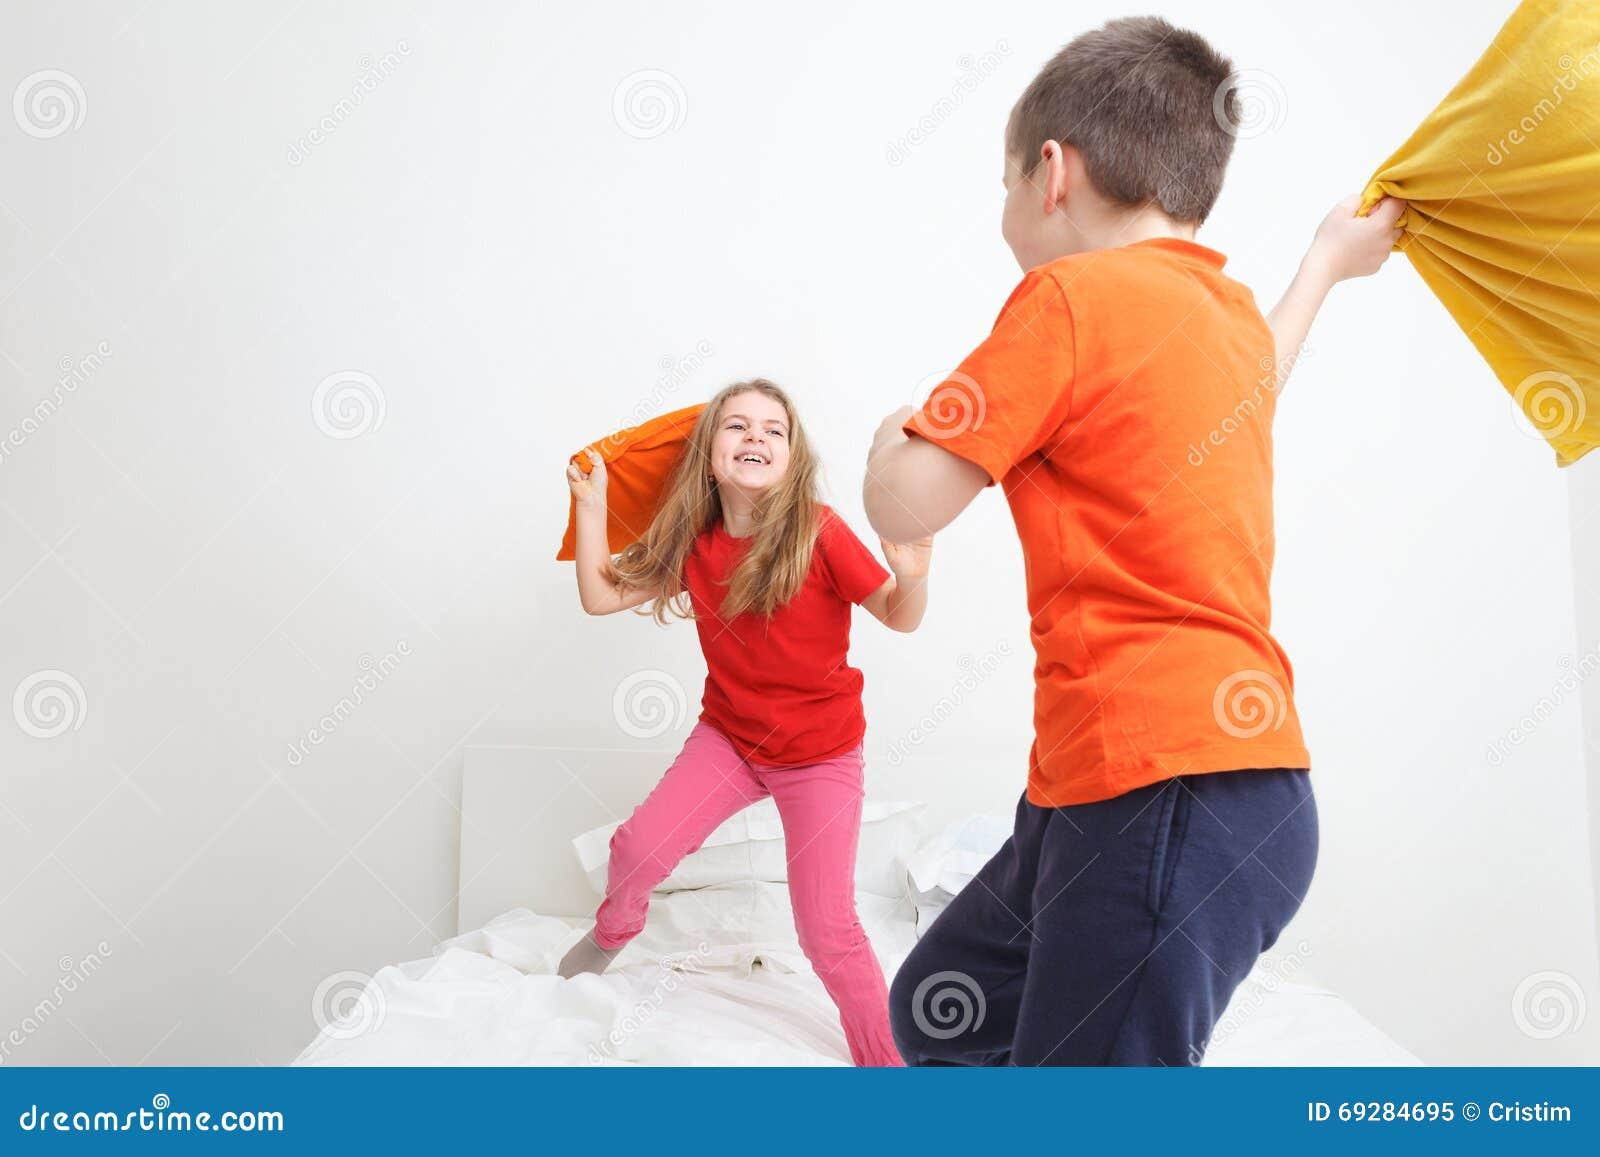 Kids Pillow Fight Stock Photo - Image: 69284695